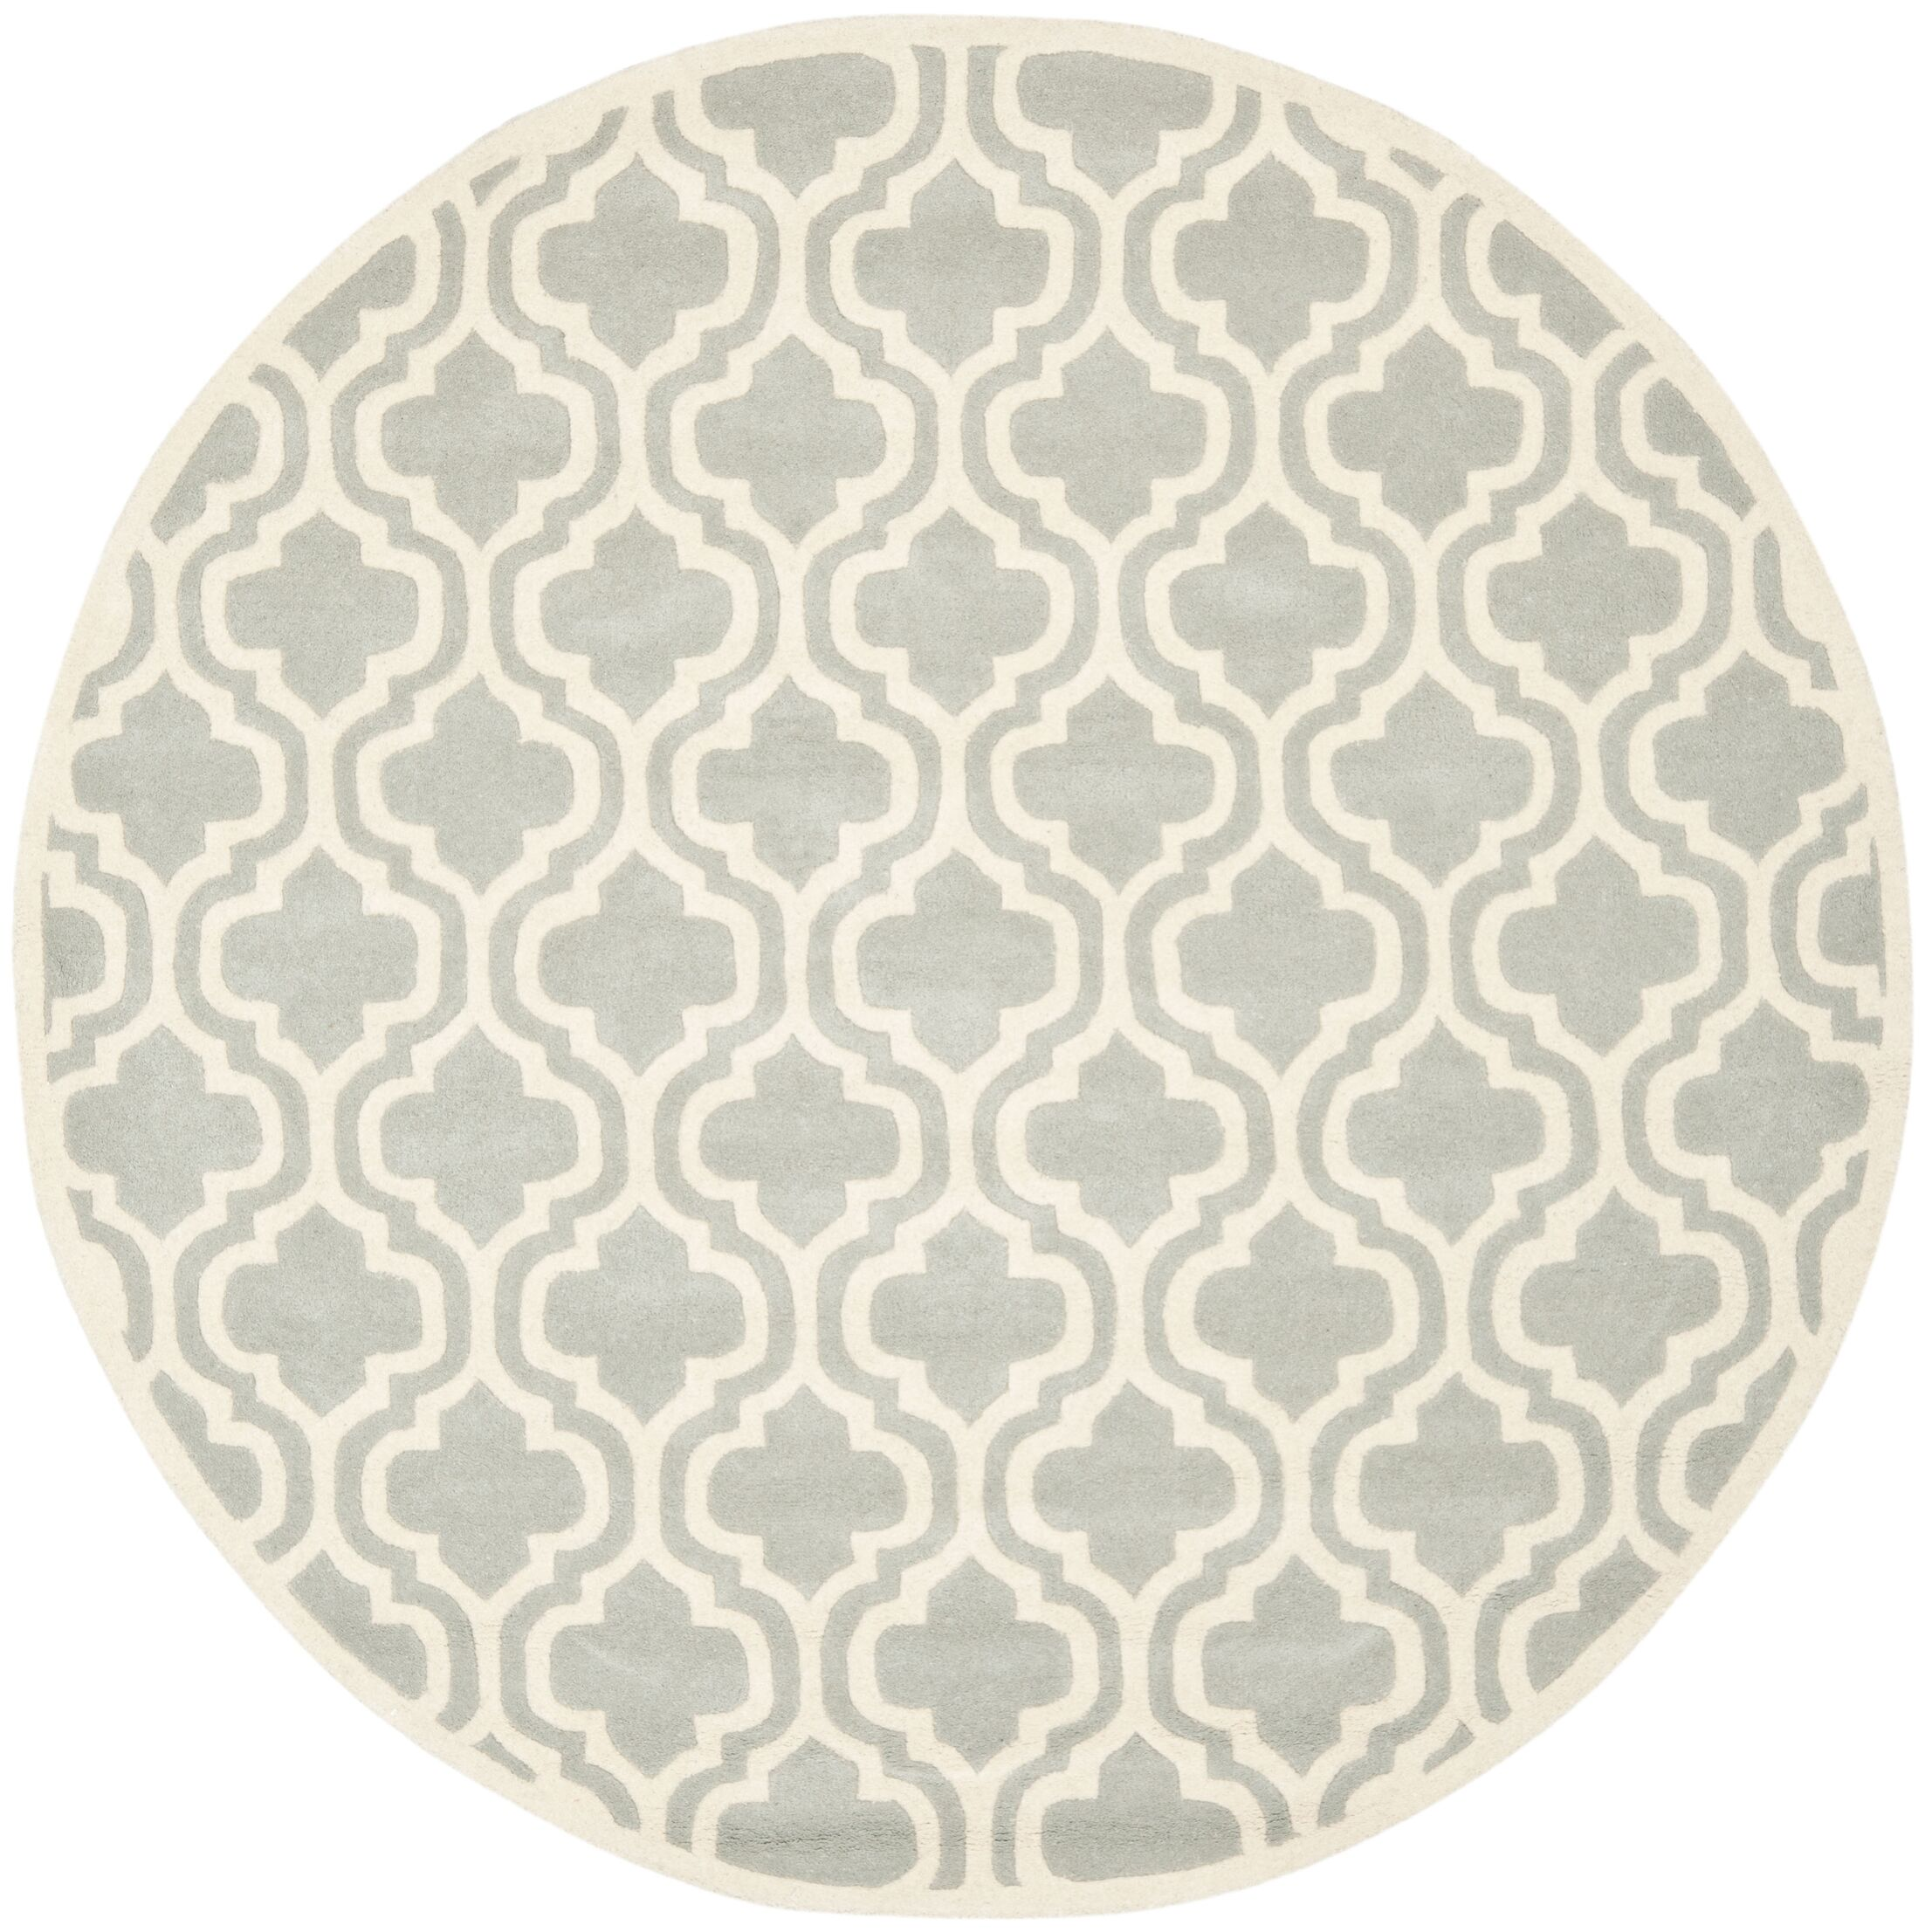 Wilkin Grey / Ivory Rug Rug Size: Round 7'